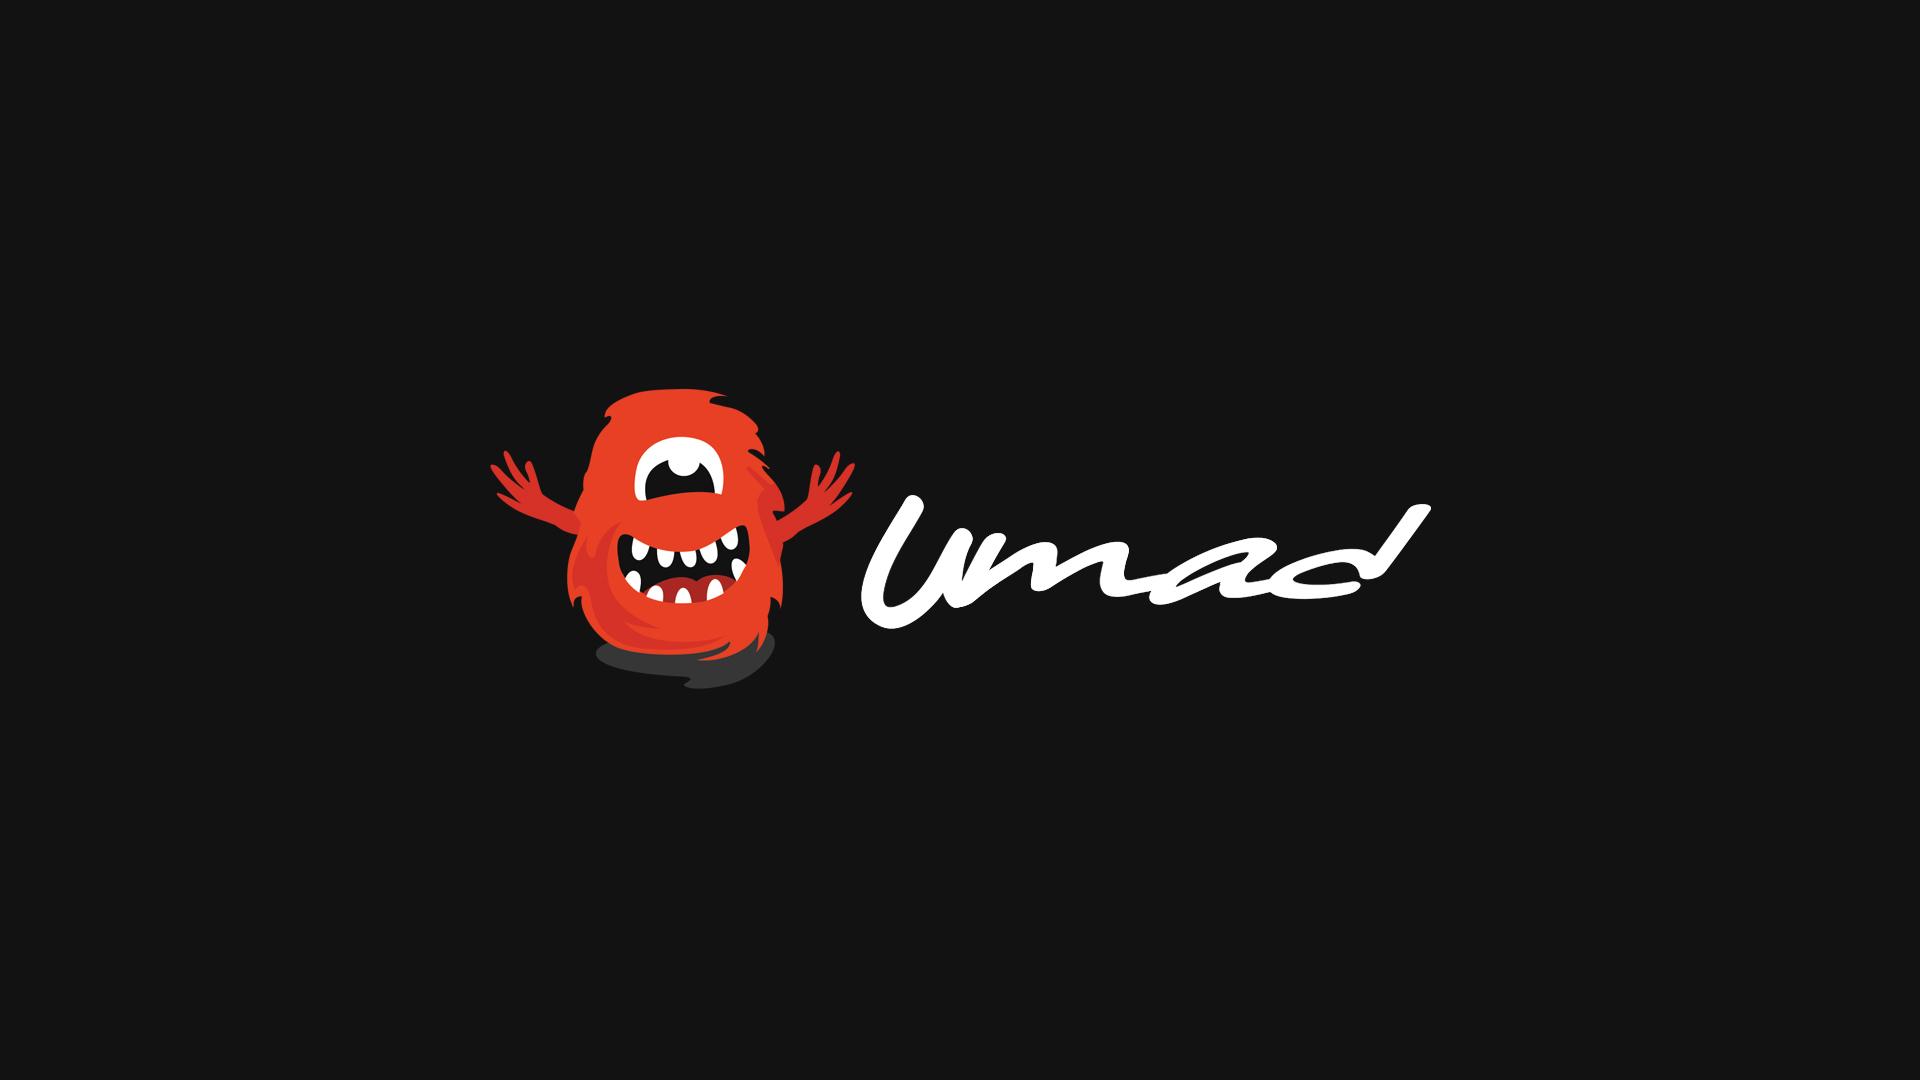 umad logo wallpaper 56385